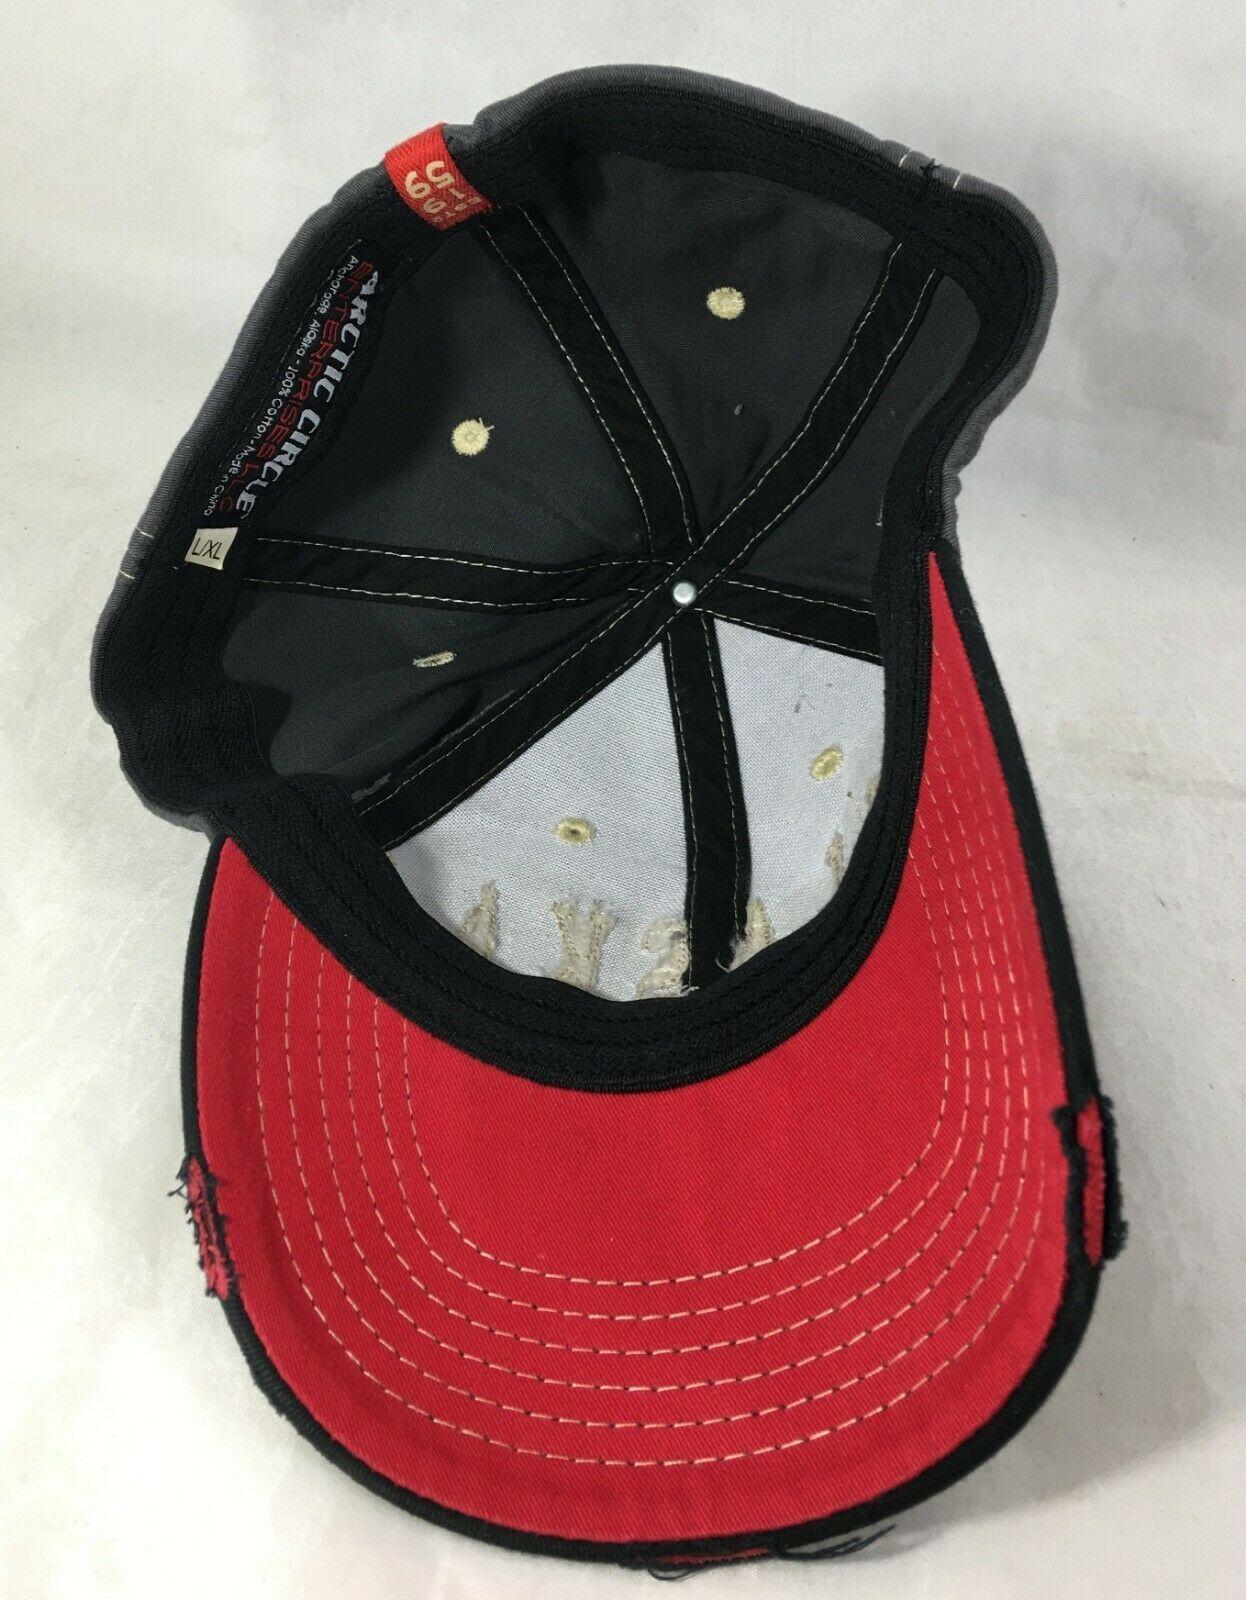 ALASKA Last Frontier Since 1959 Cap Baseball Hat Black Red Distressed L/XL